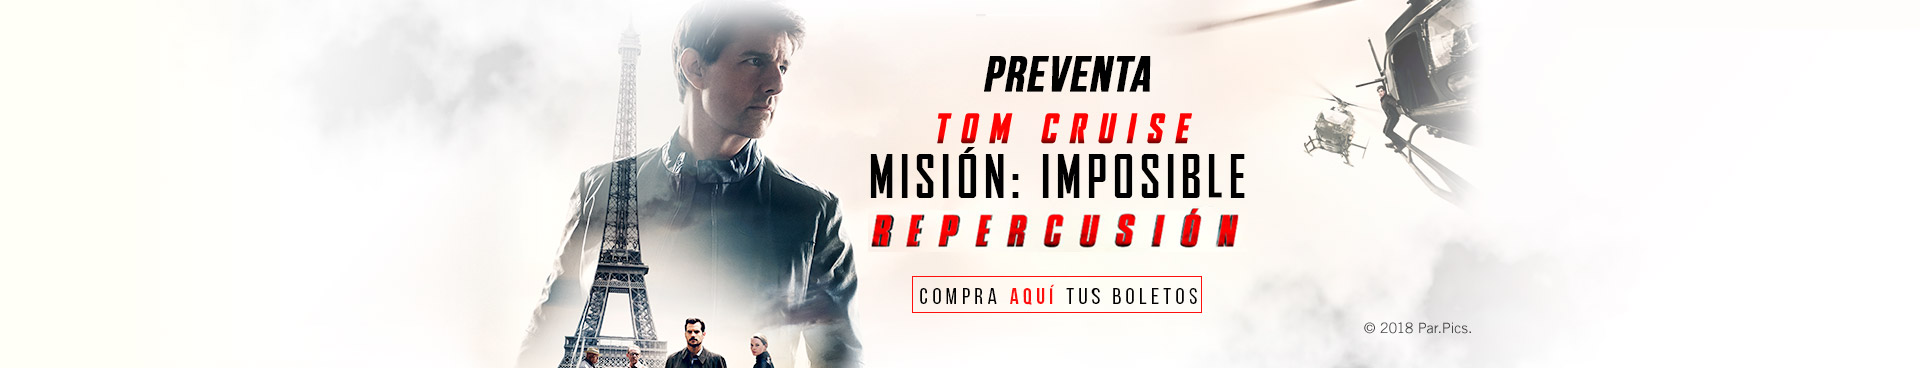 Preventa: Misión: Imposible Repercusión